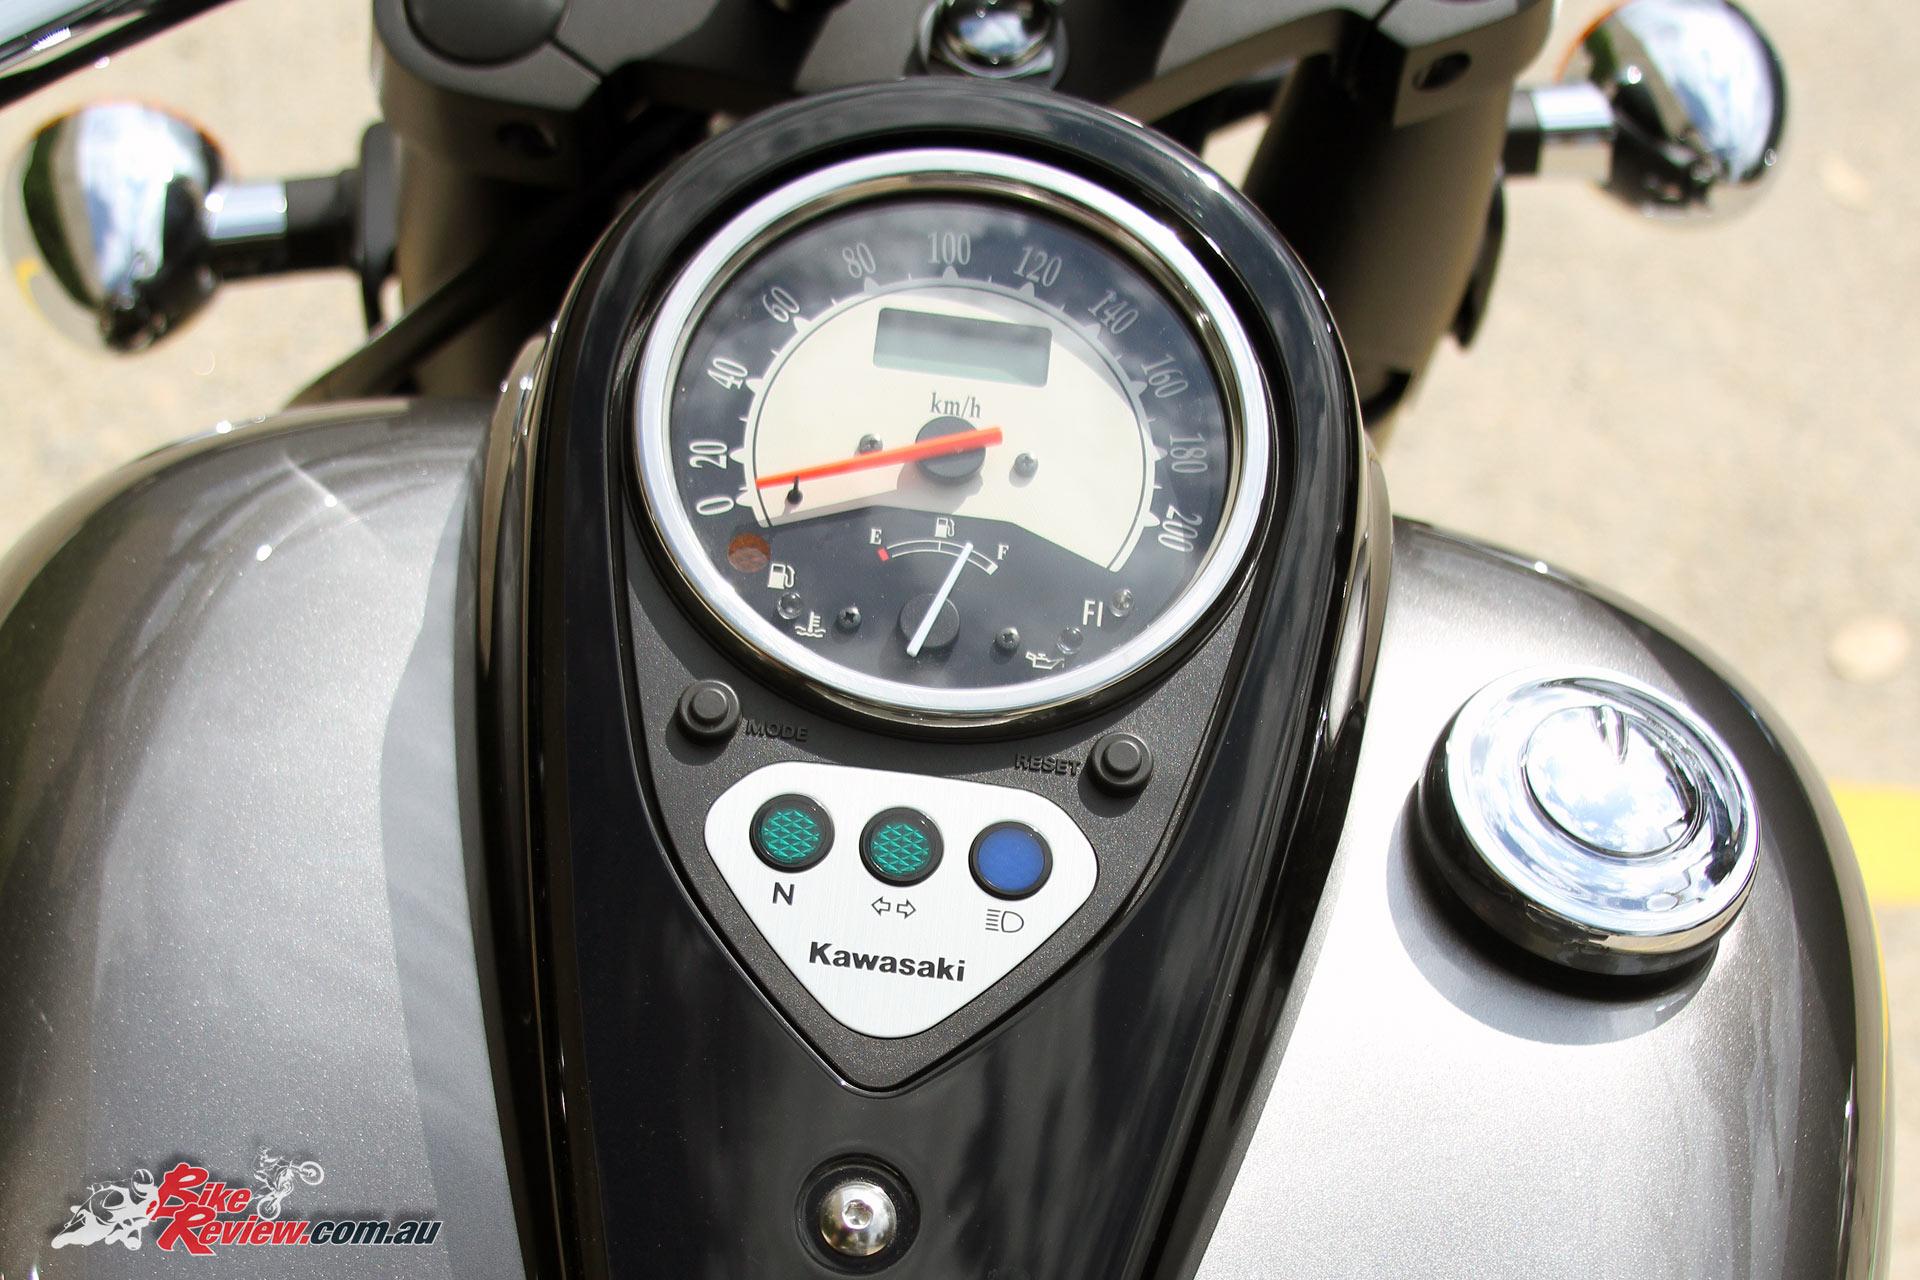 2017 Kawasaki Vulcan 900 Classic - tank mounted dash, with analogue speedo and basic idiot lights